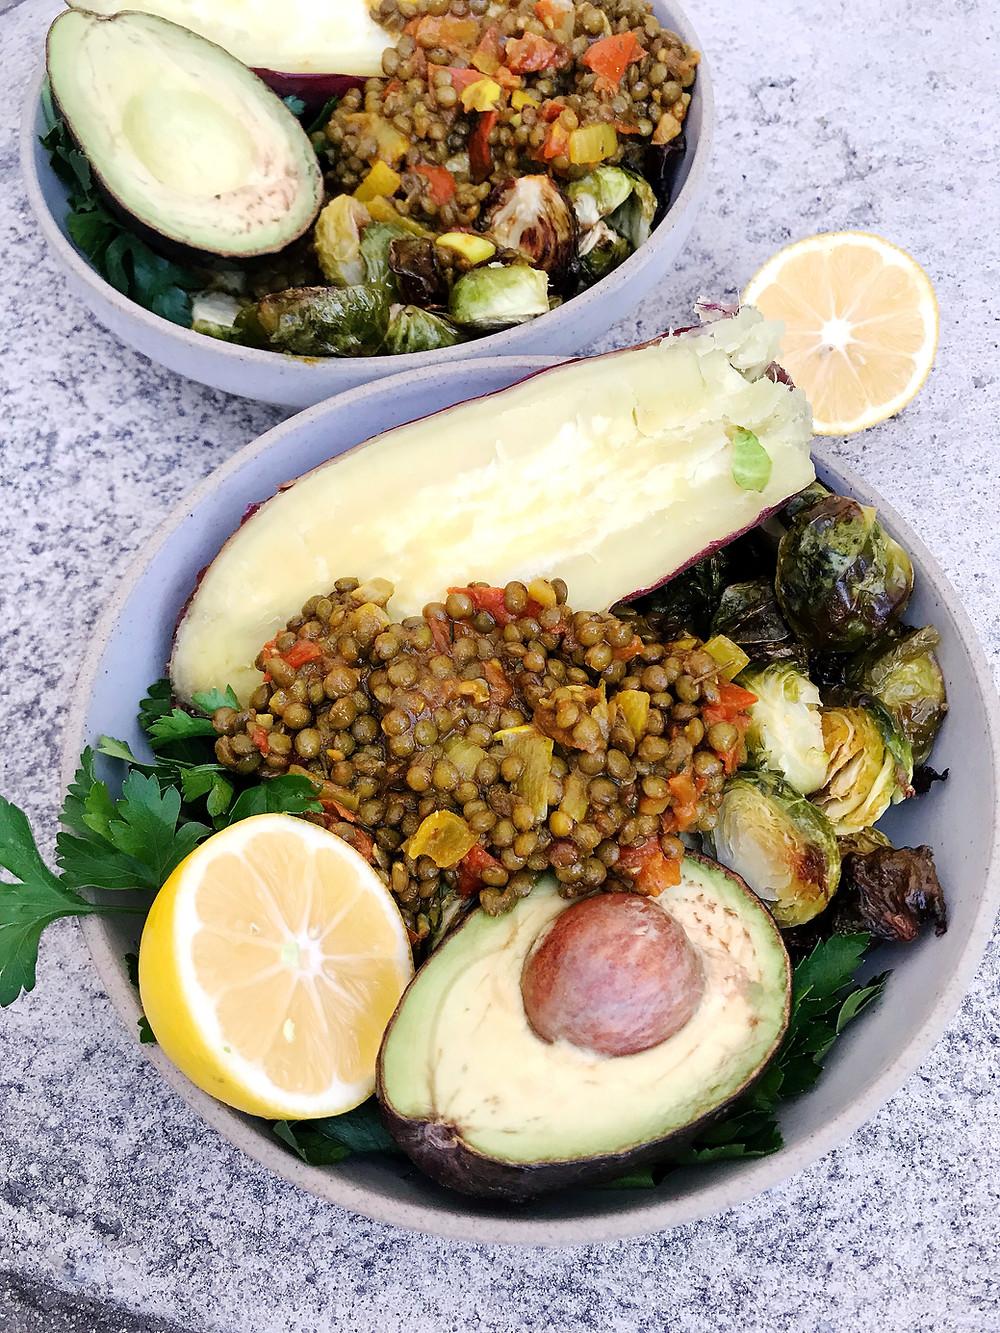 autumn elle nutrition intermittent fasting detox program review results